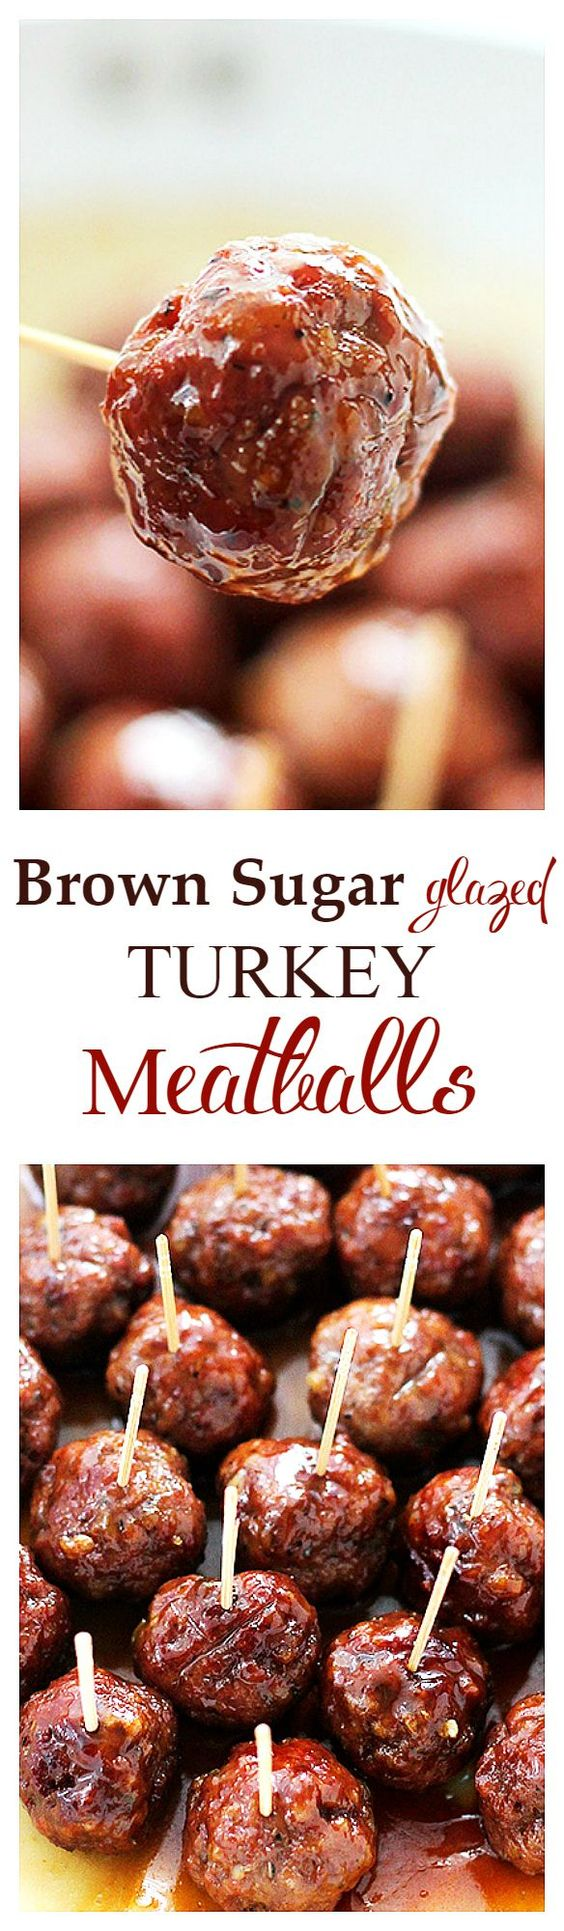 brown sugar glaze brown sugar pound cake with maple espresso glaze ...